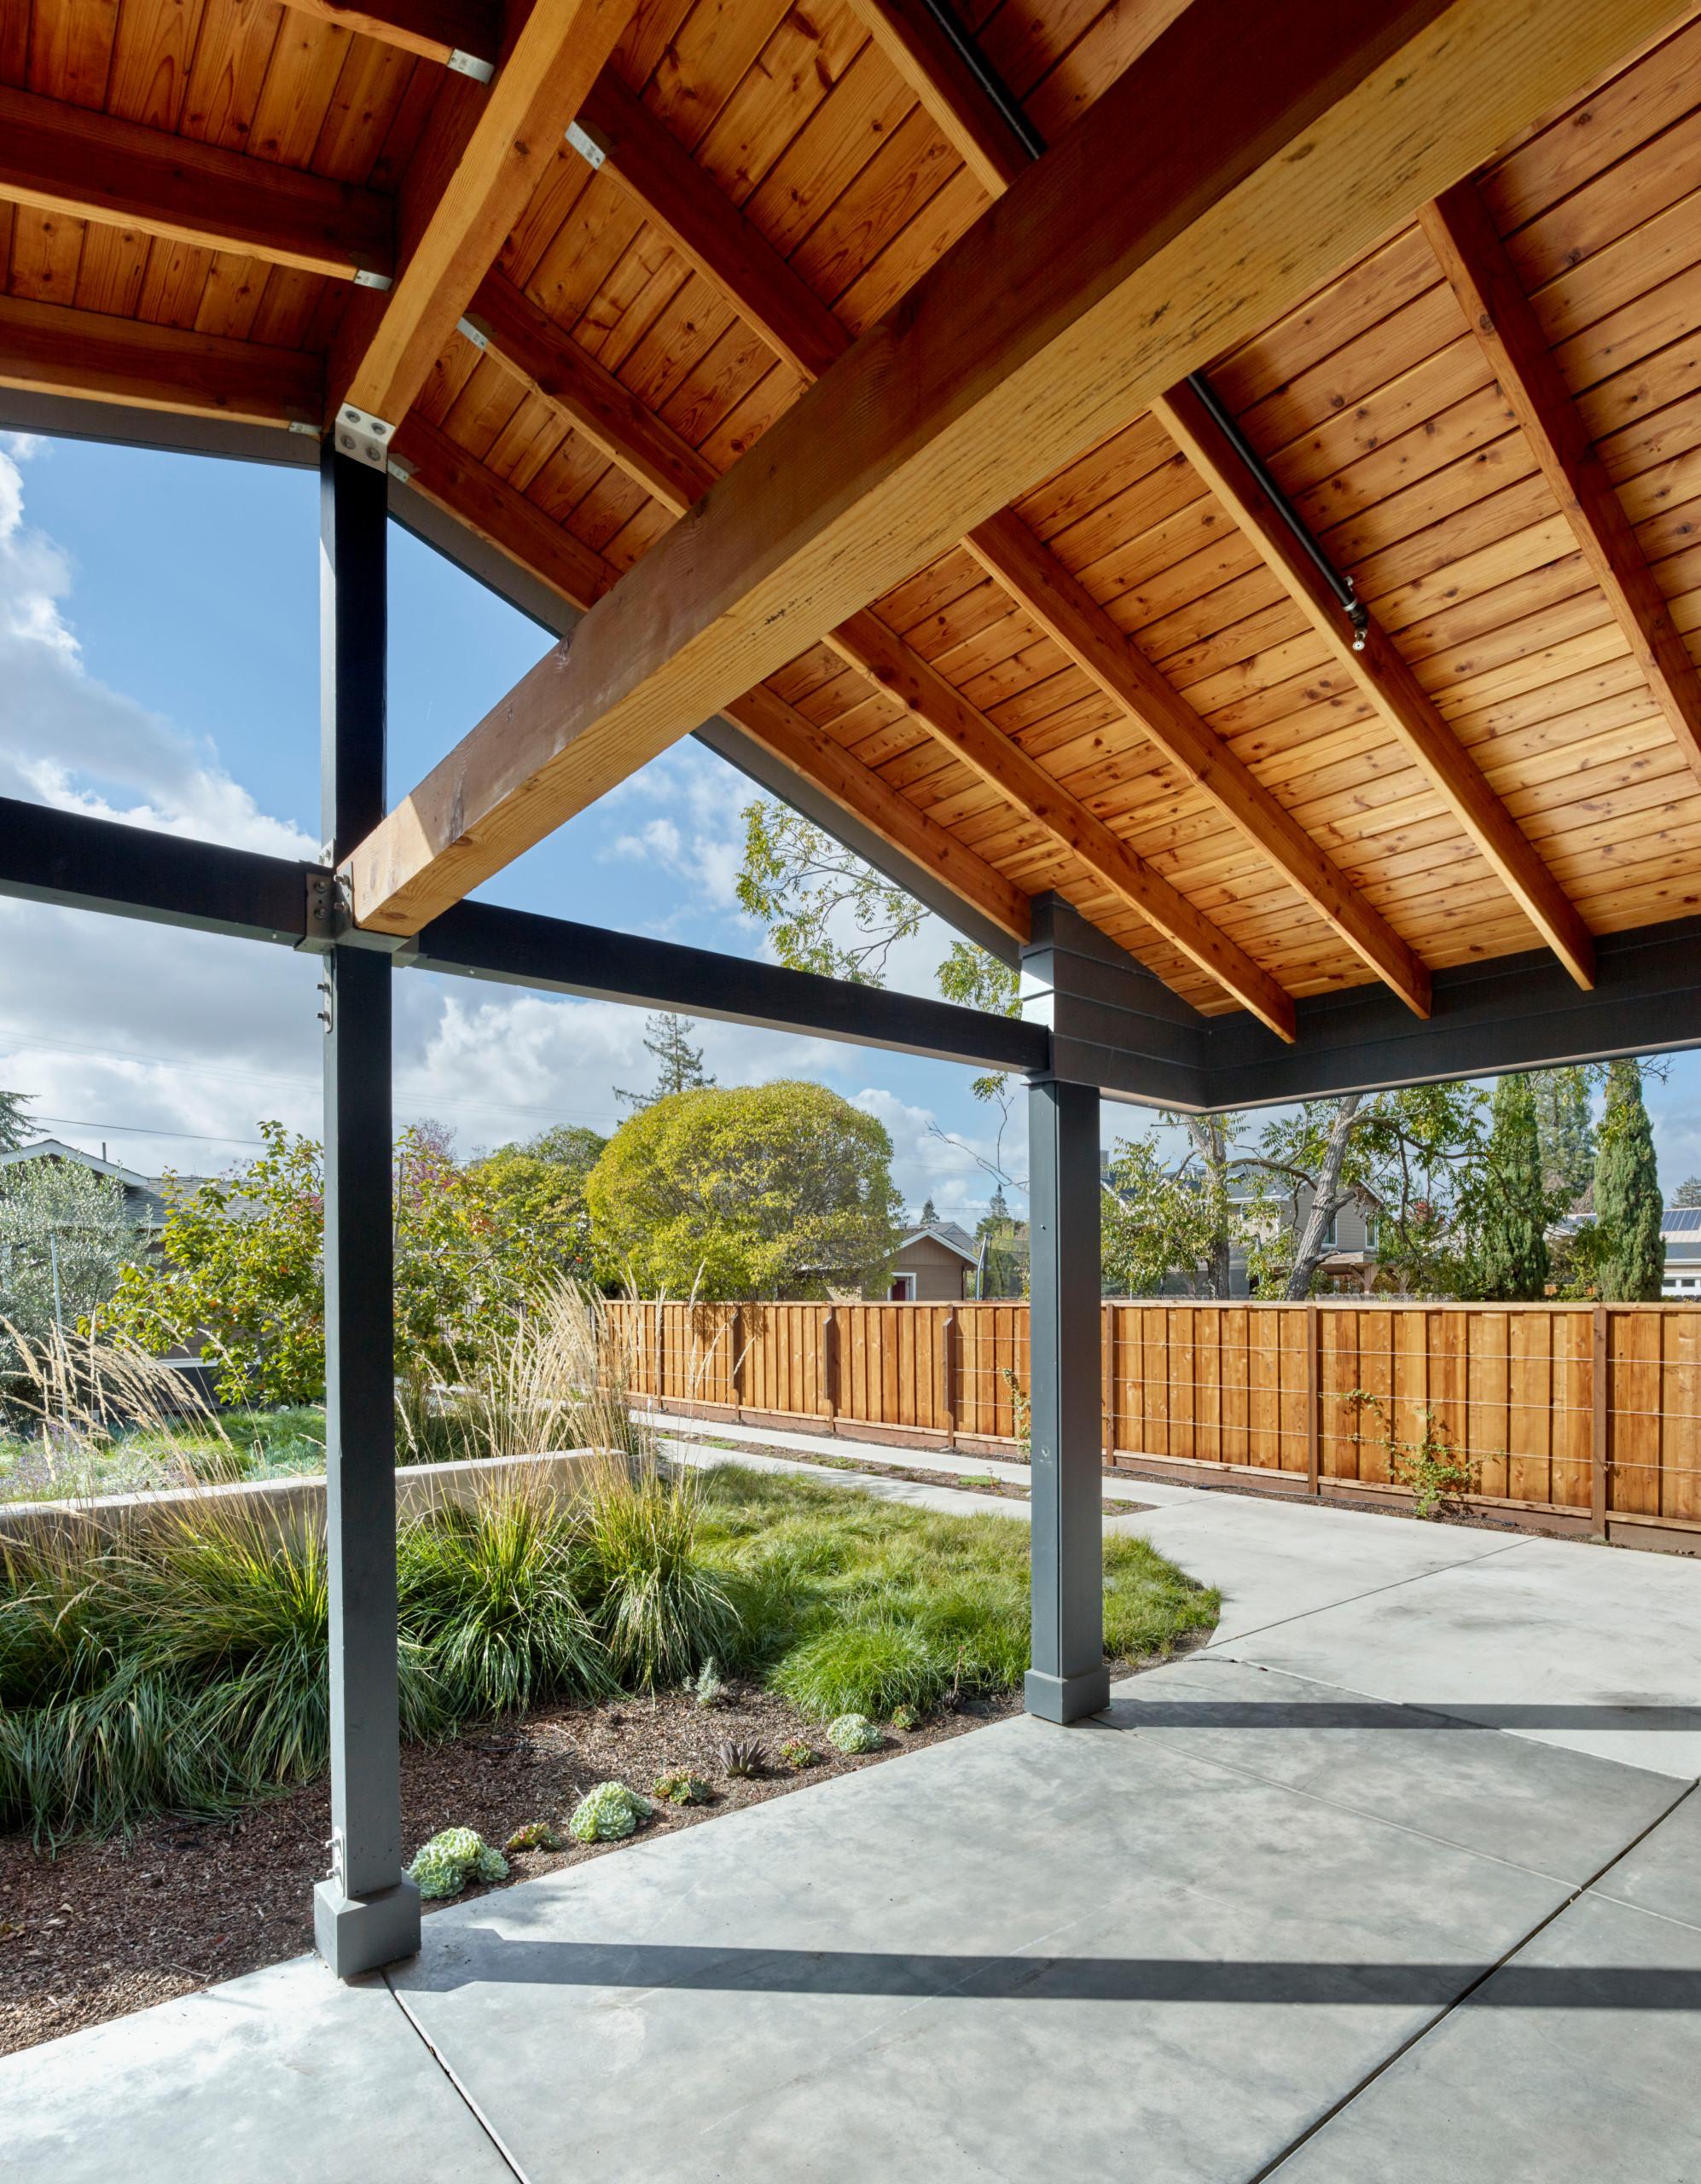 75 Beautiful Modern Carport Pictures Ideas July 2021 Houzz